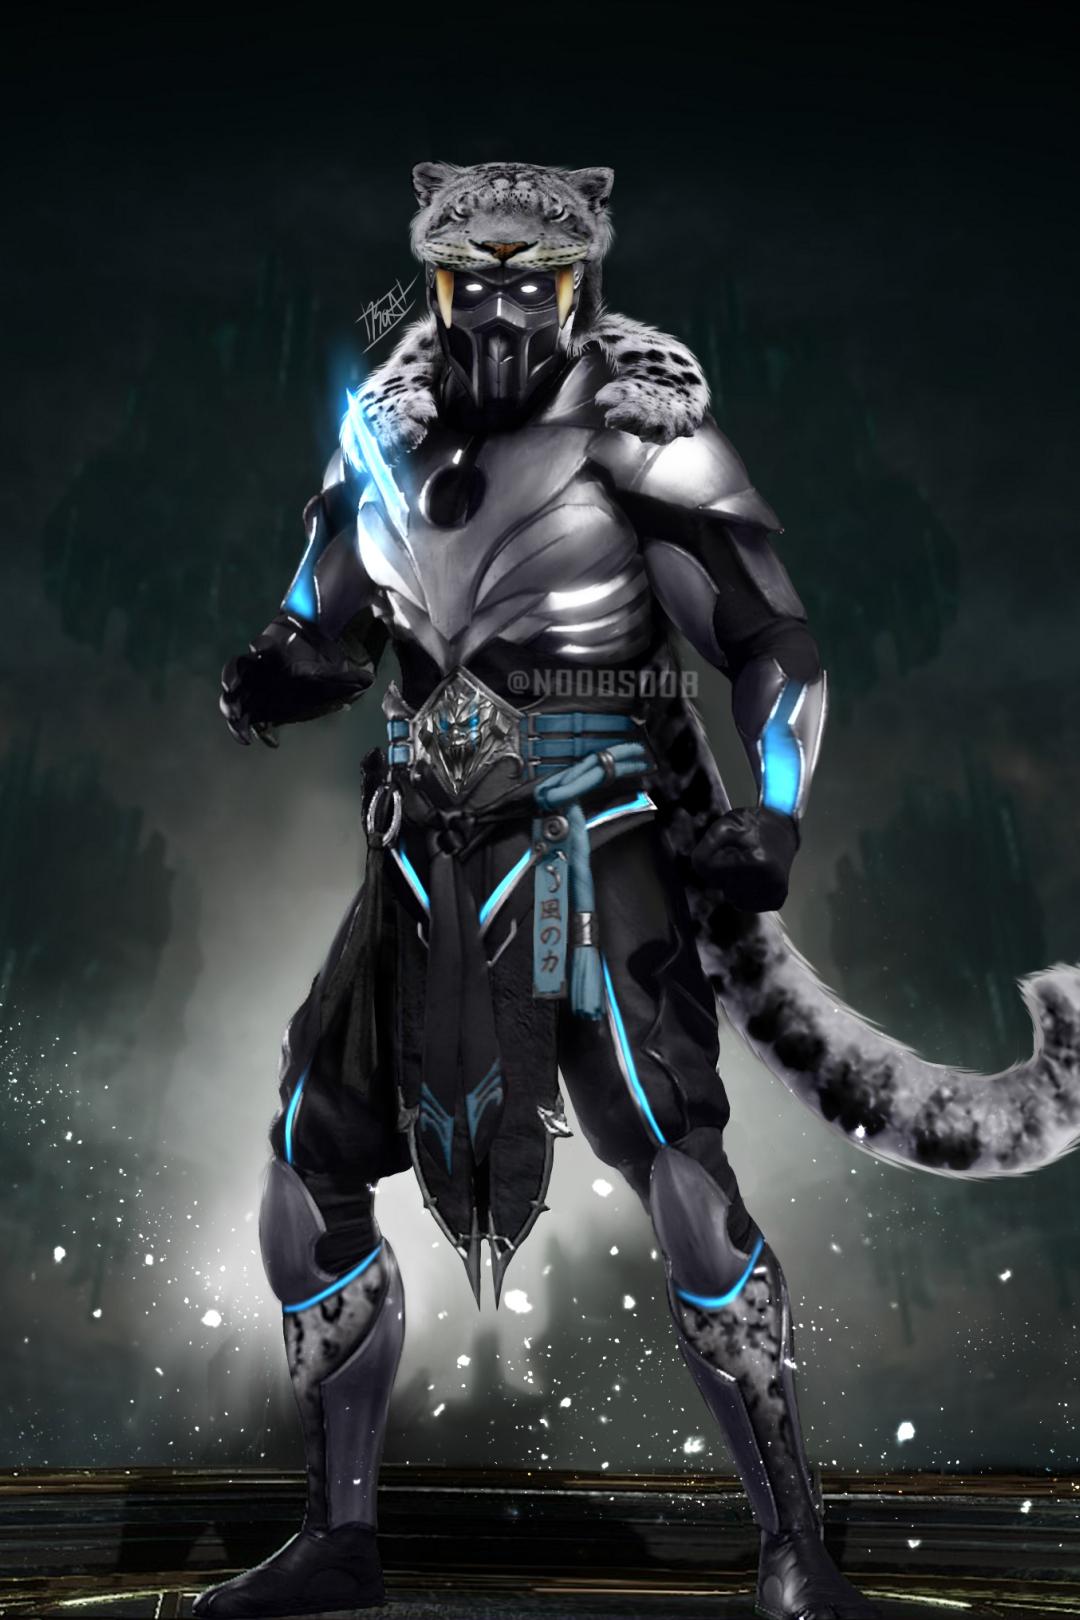 1080x1620 Mortal Kombat 11 Character Digital 1080x1620 ...